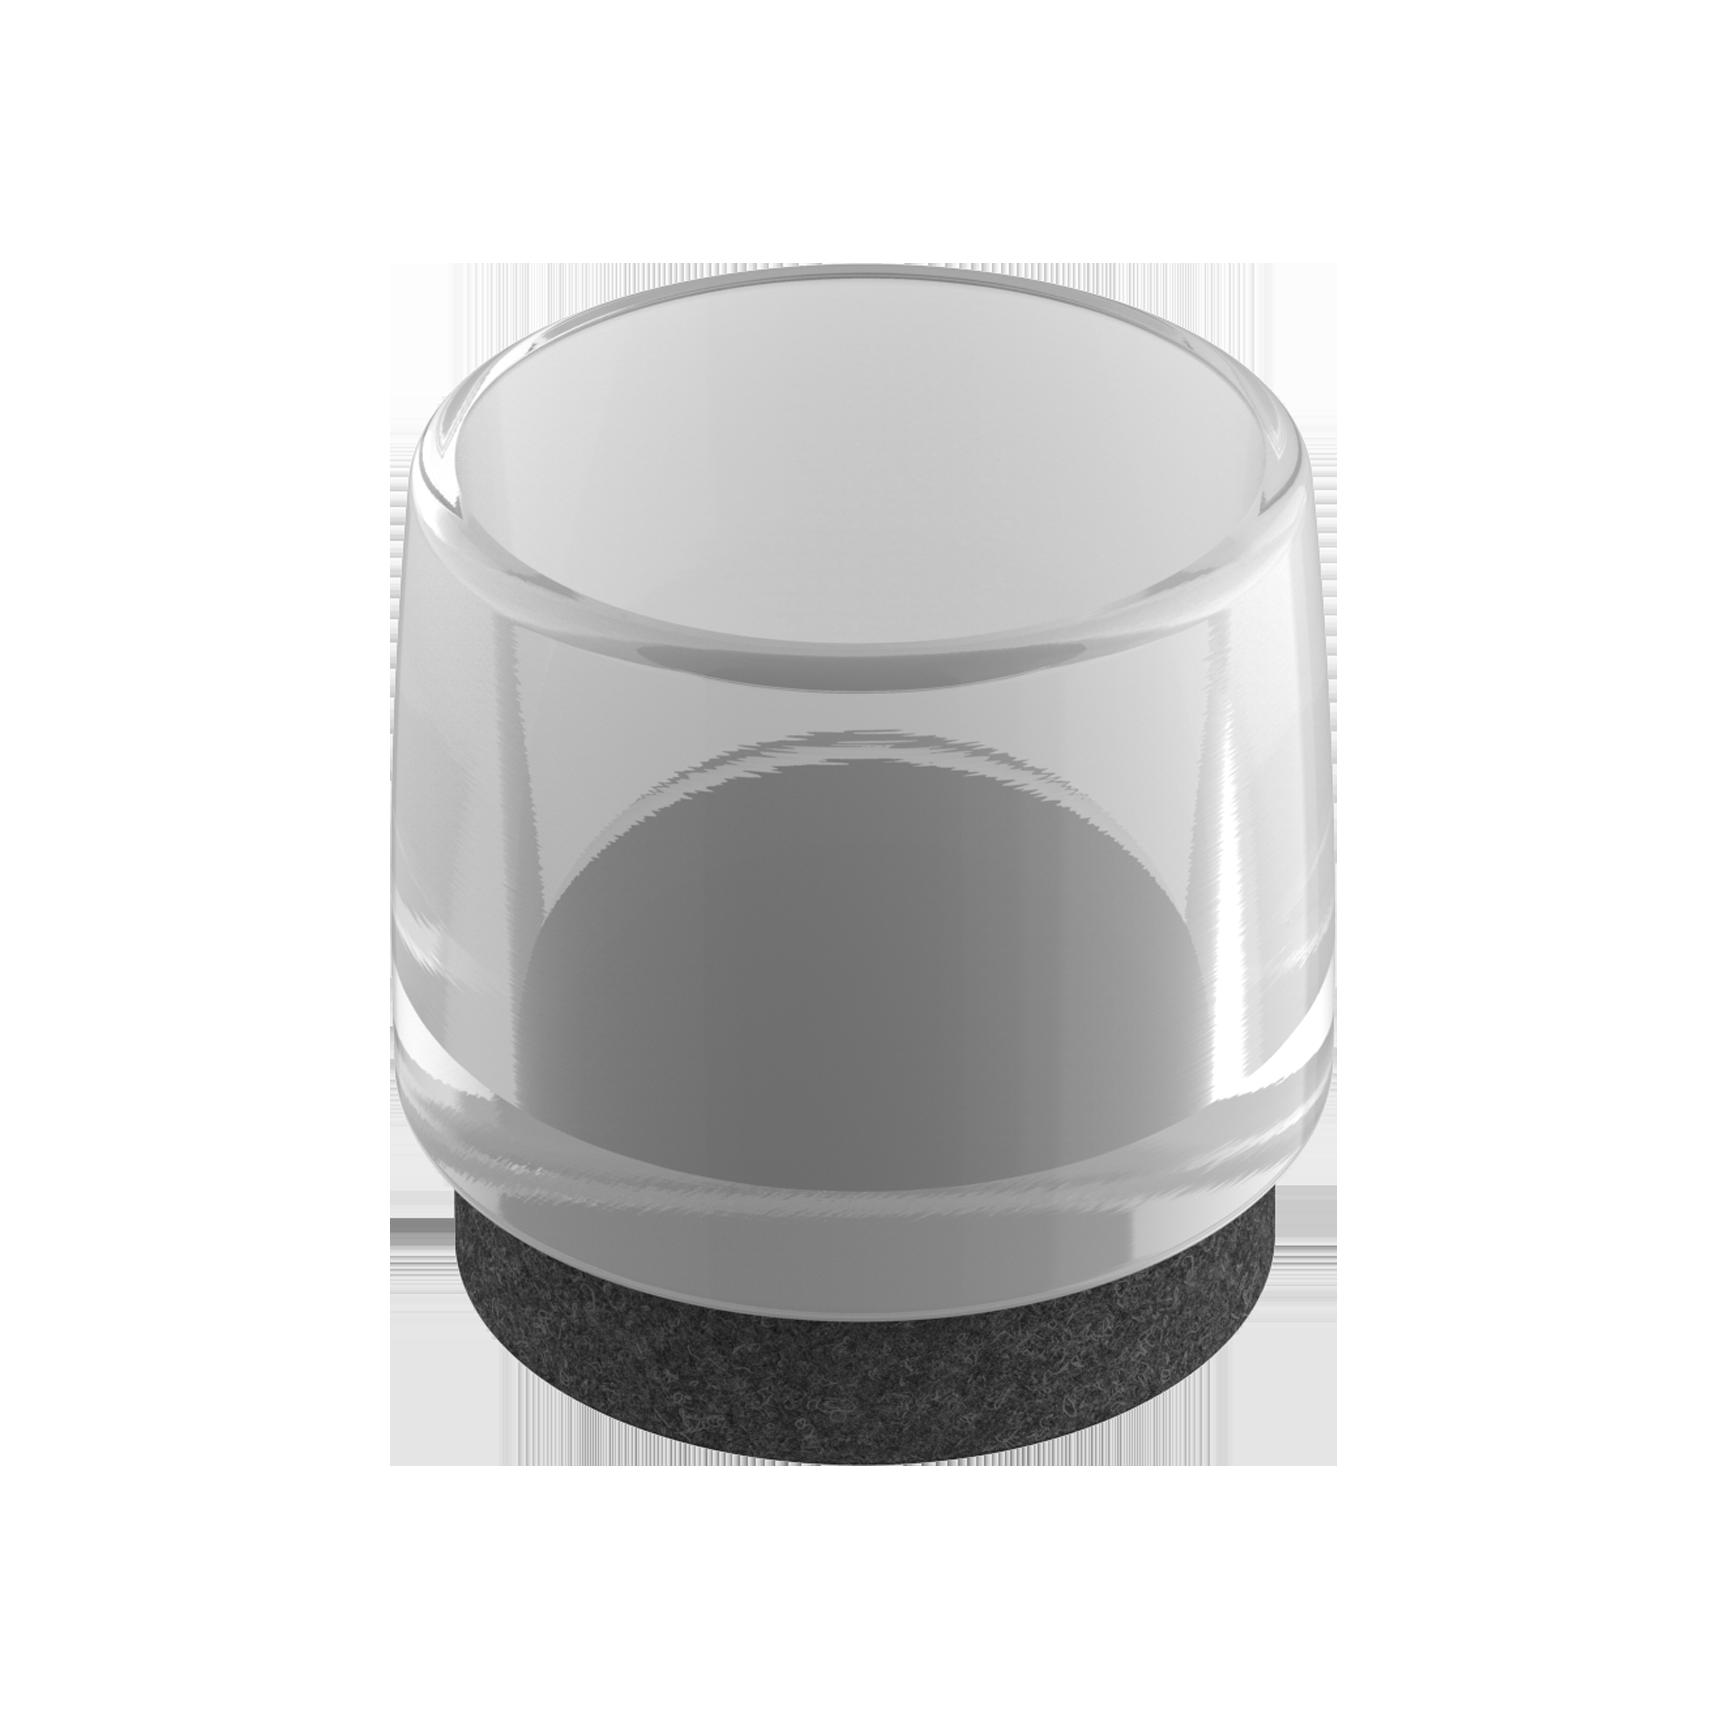 Embouts ronds - ISC Plastic Parts